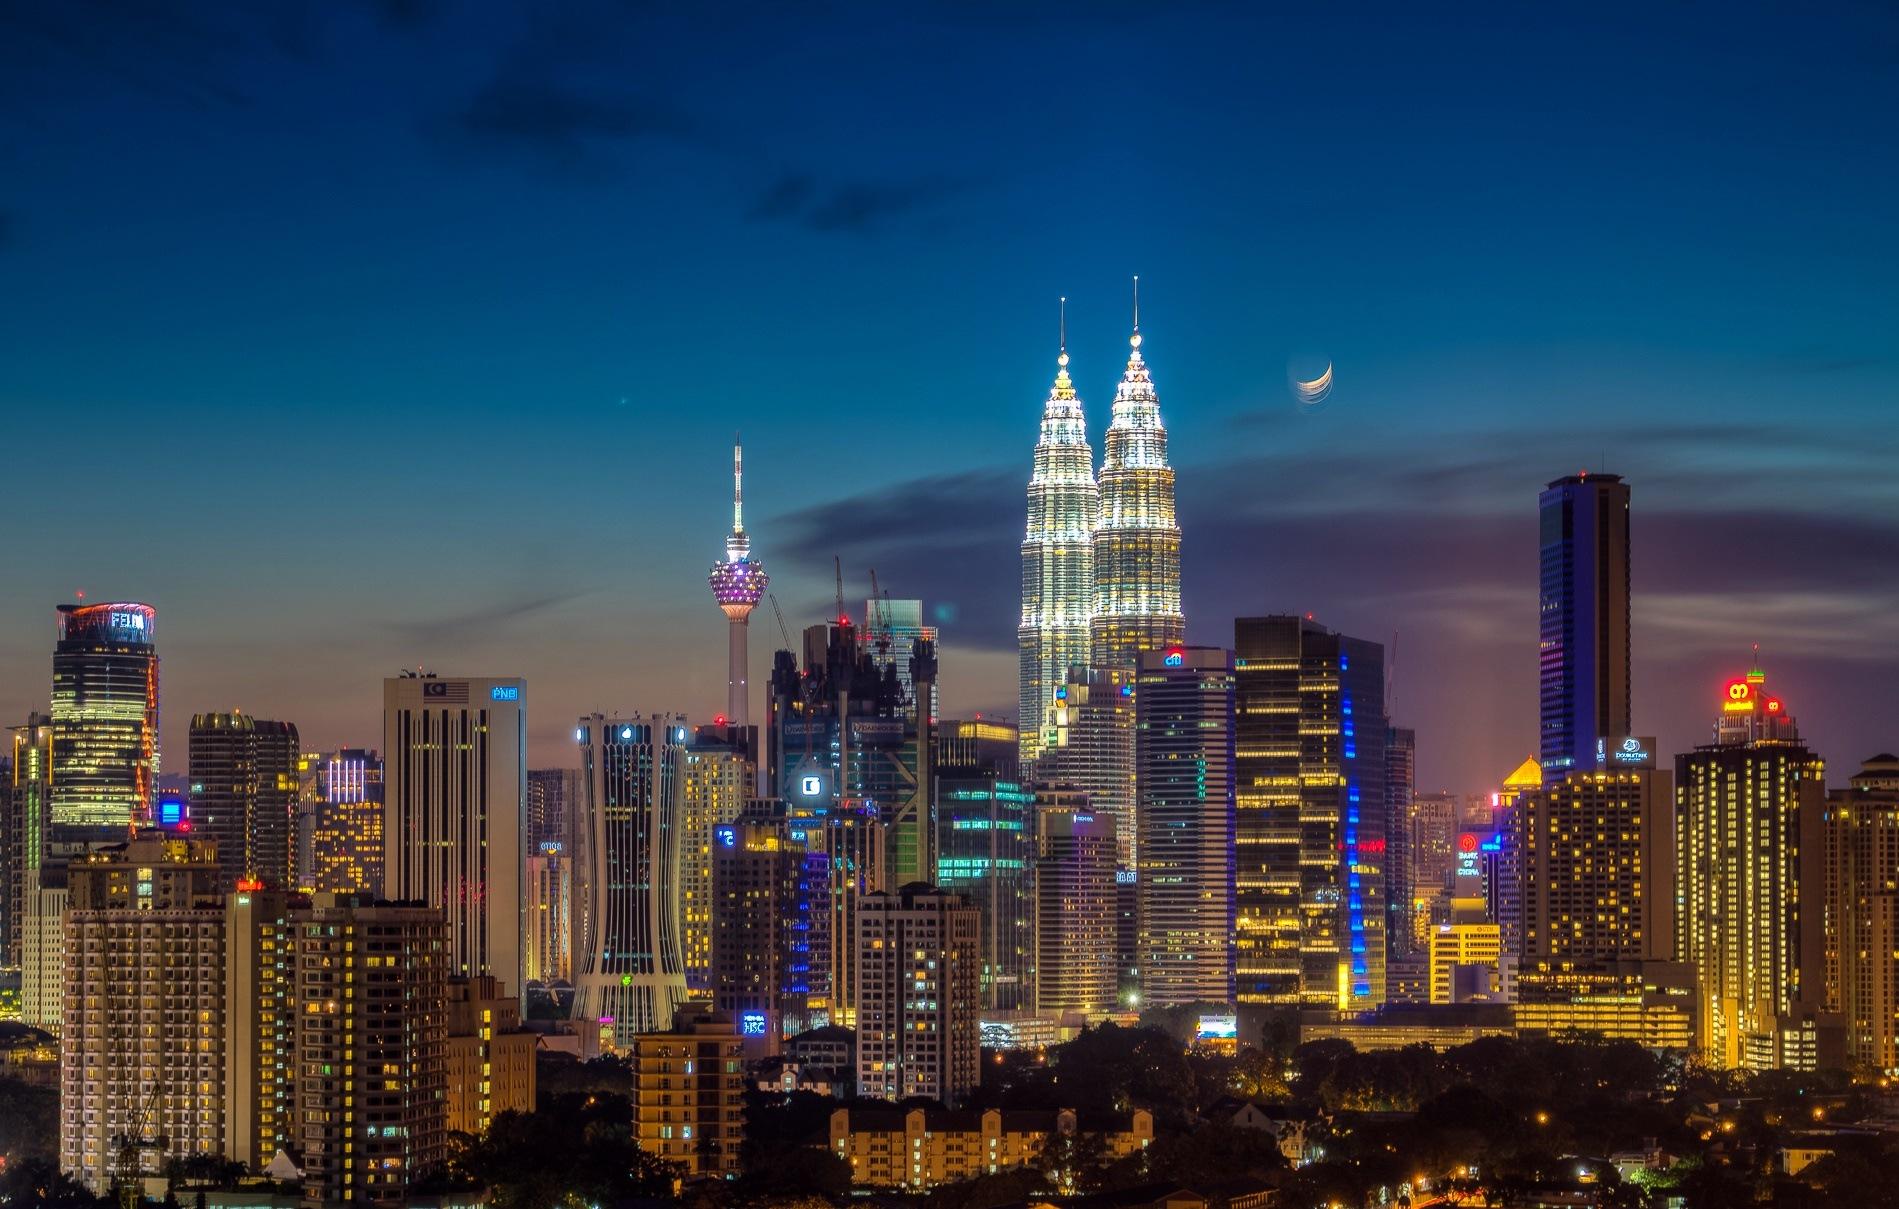 Kuala Lumpur - Rejsdiglykkelig.dk